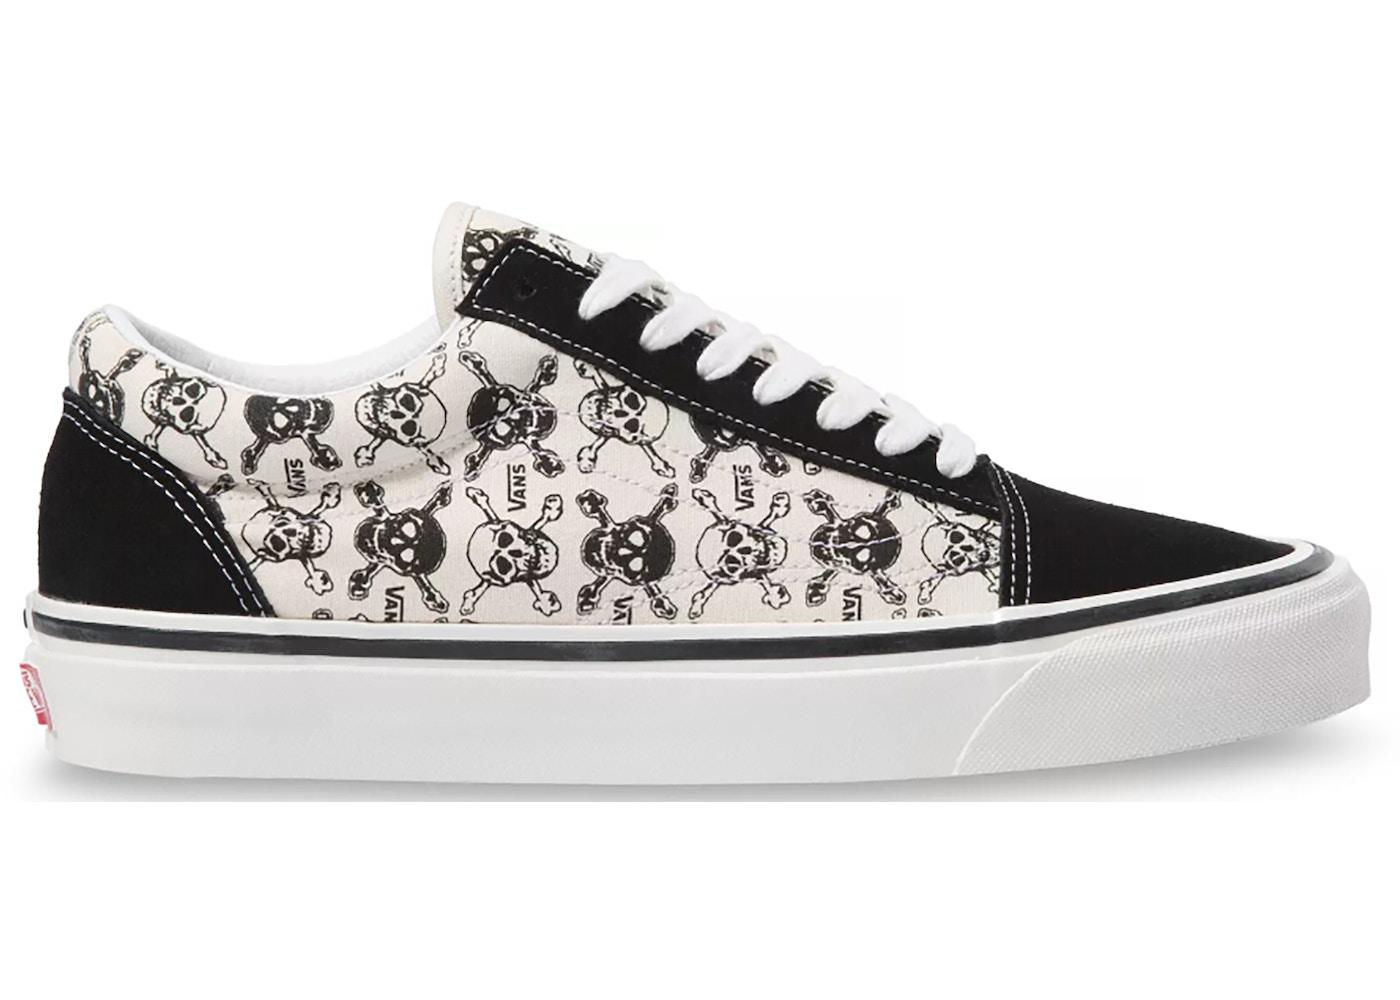 Vans Old Skool 36 DX Anaheim Factory OG Skulls - Sneakers